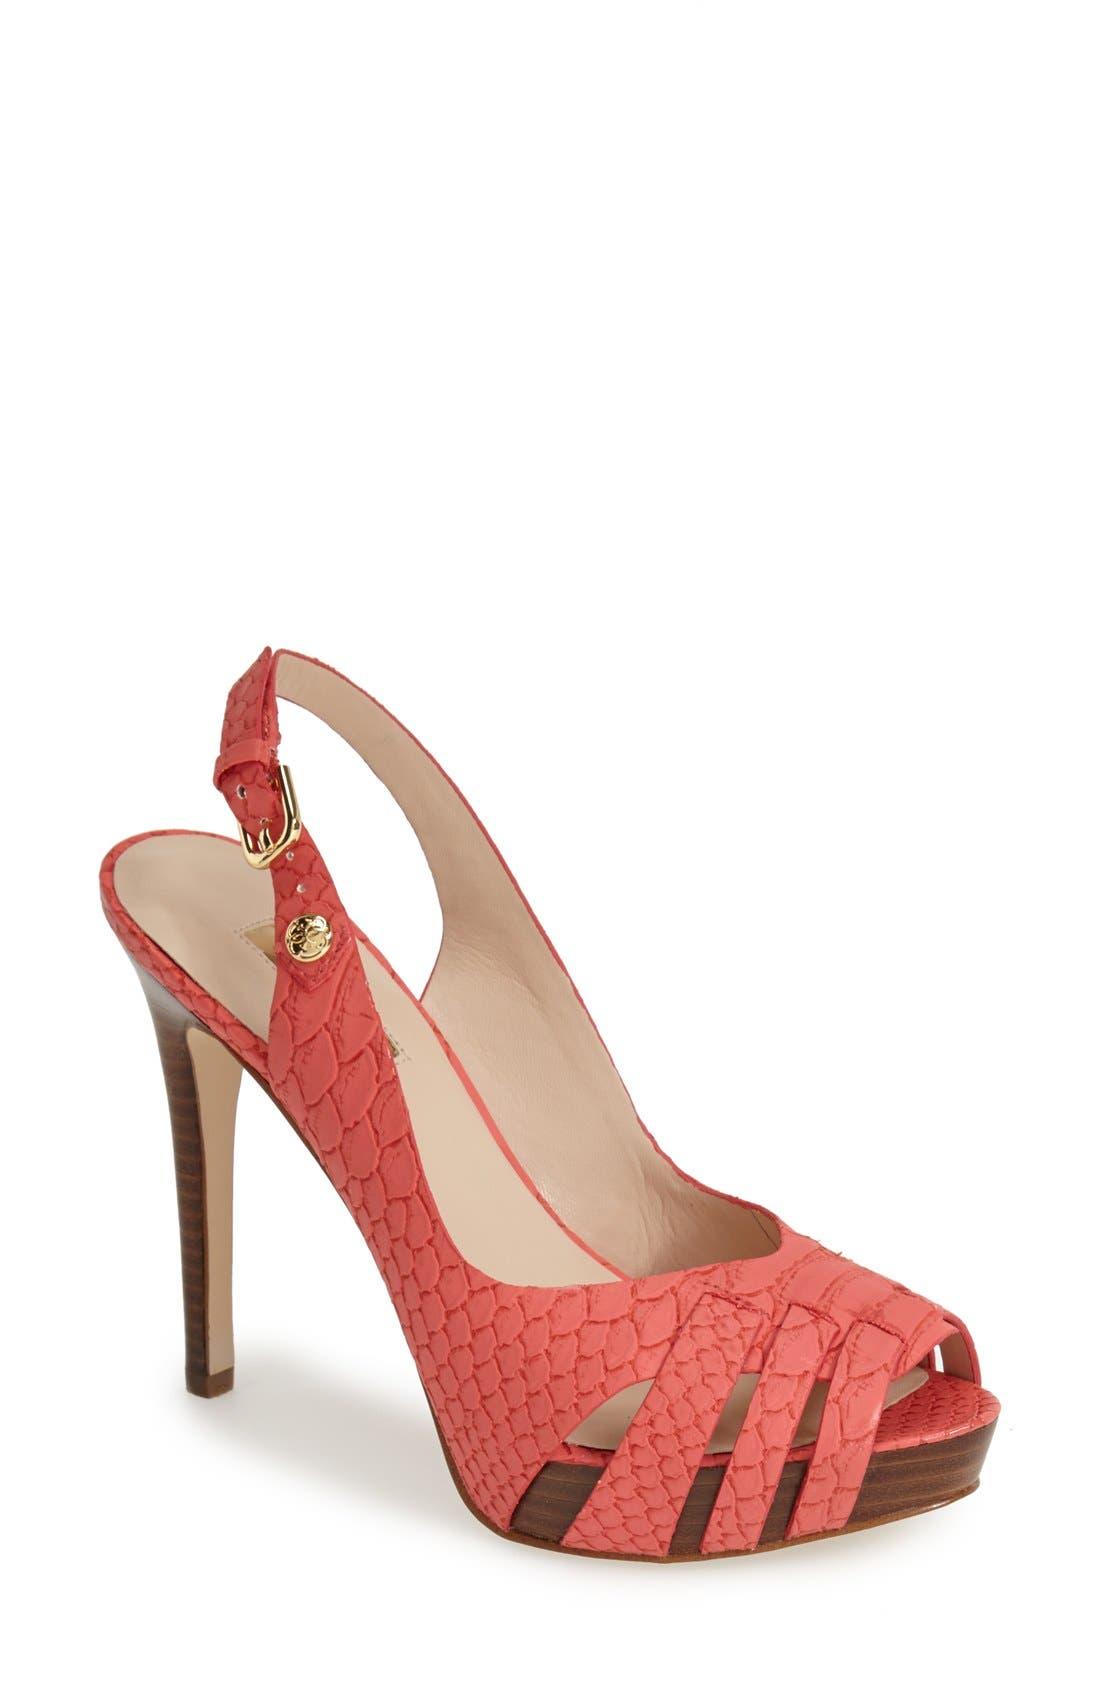 Alternate Image 1 Selected - GUESS 'Haben' Peep Toe Platform Sandal (Women)